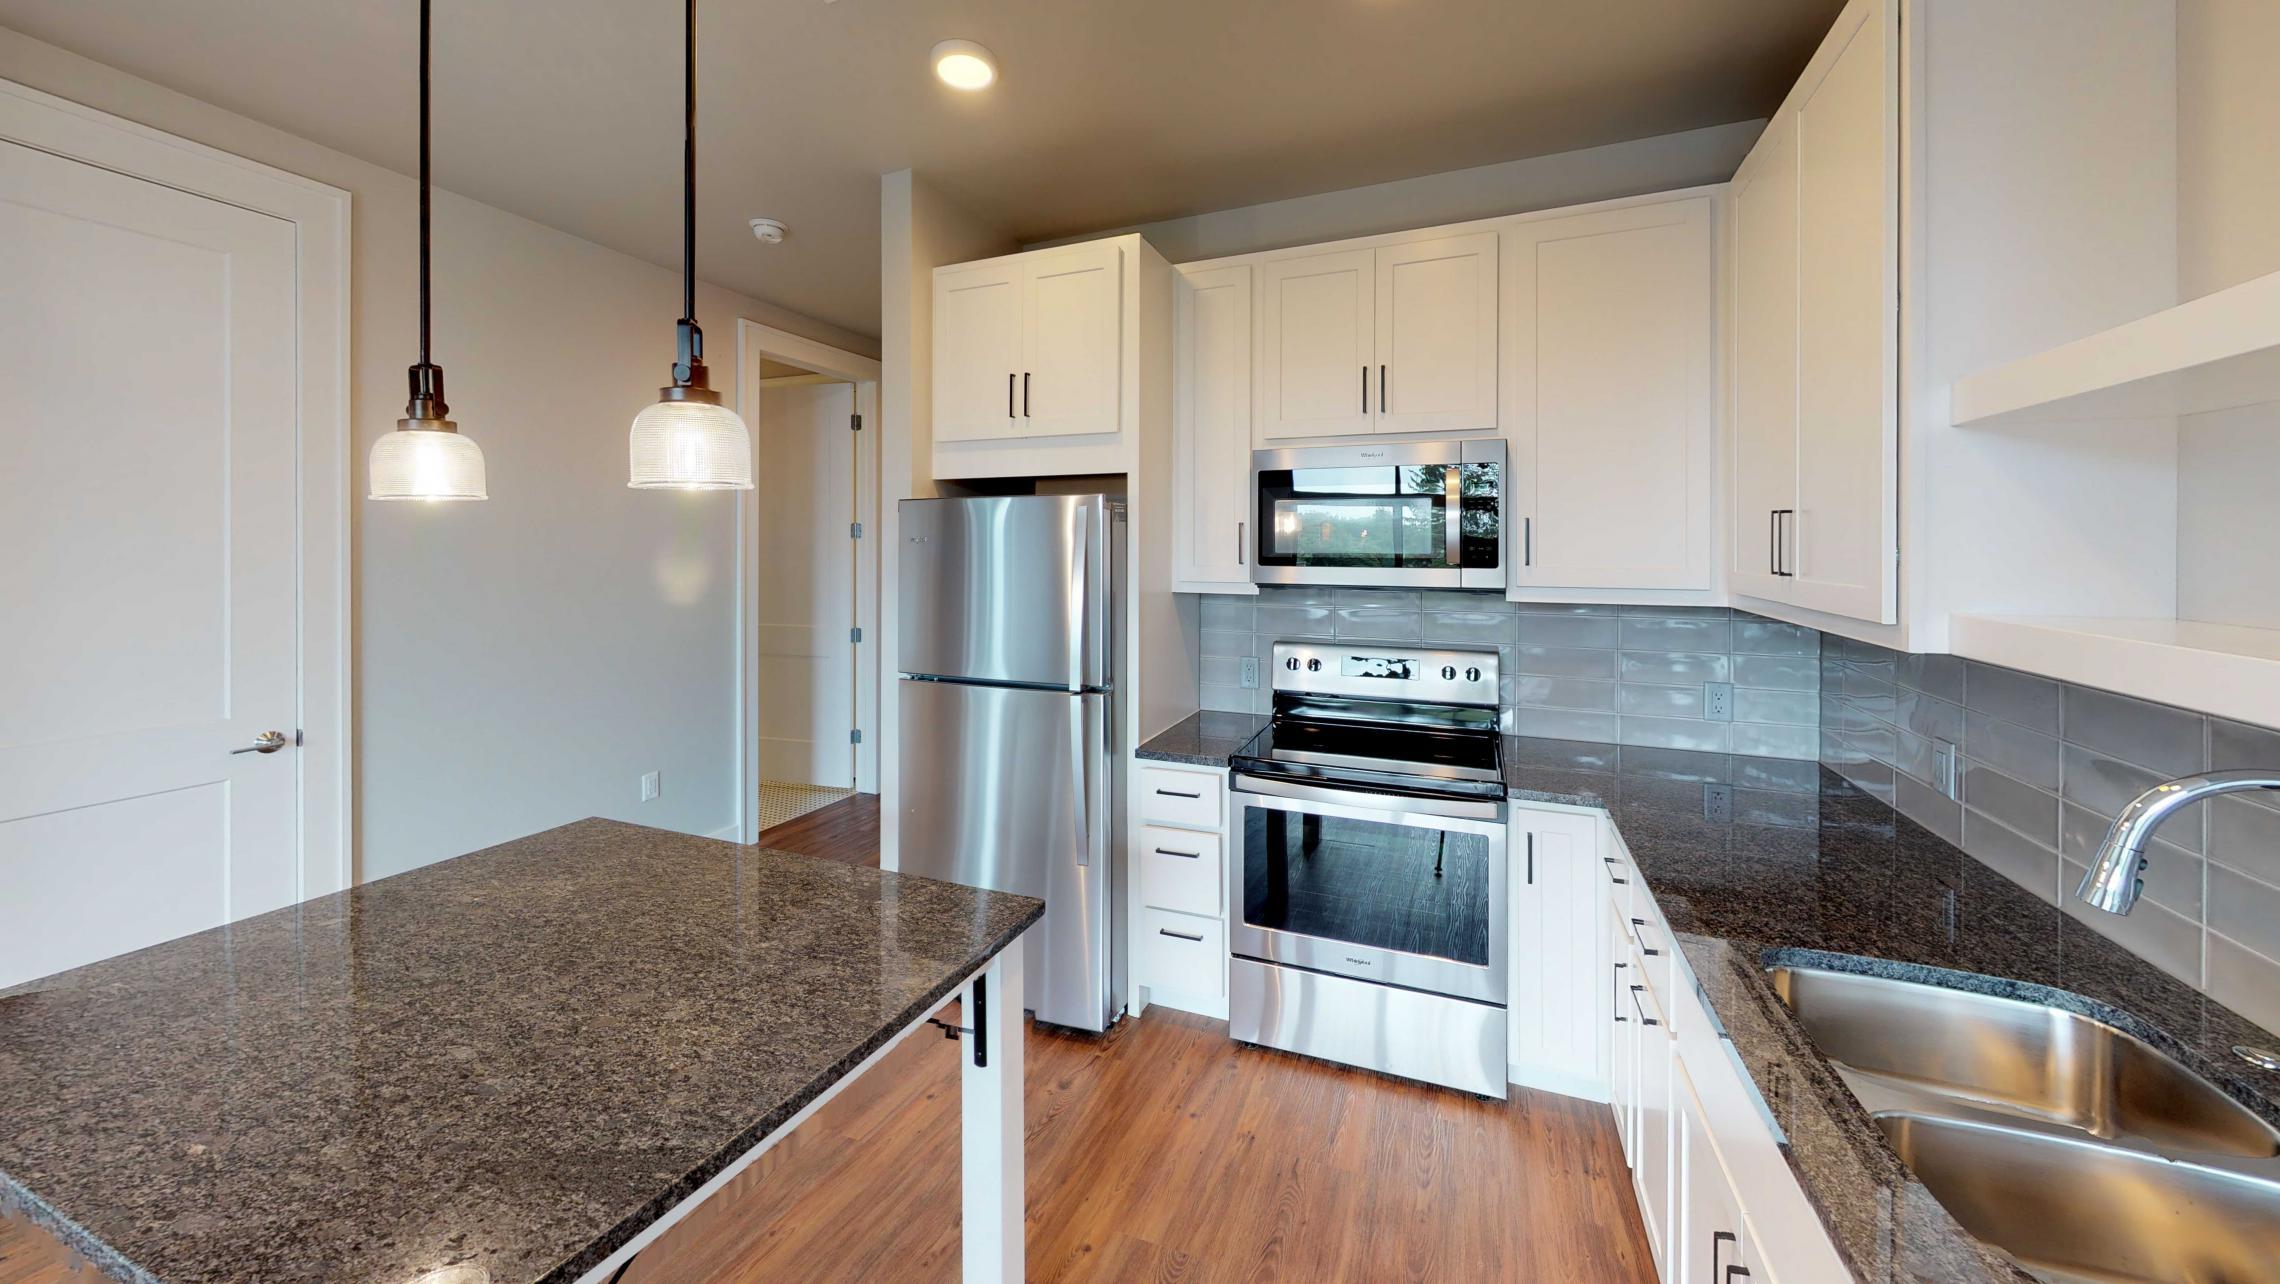 1722-Monroe-Apartment-One Bedroom-Modern-Luxury-Kitchen-Design-Urban Living.jpg